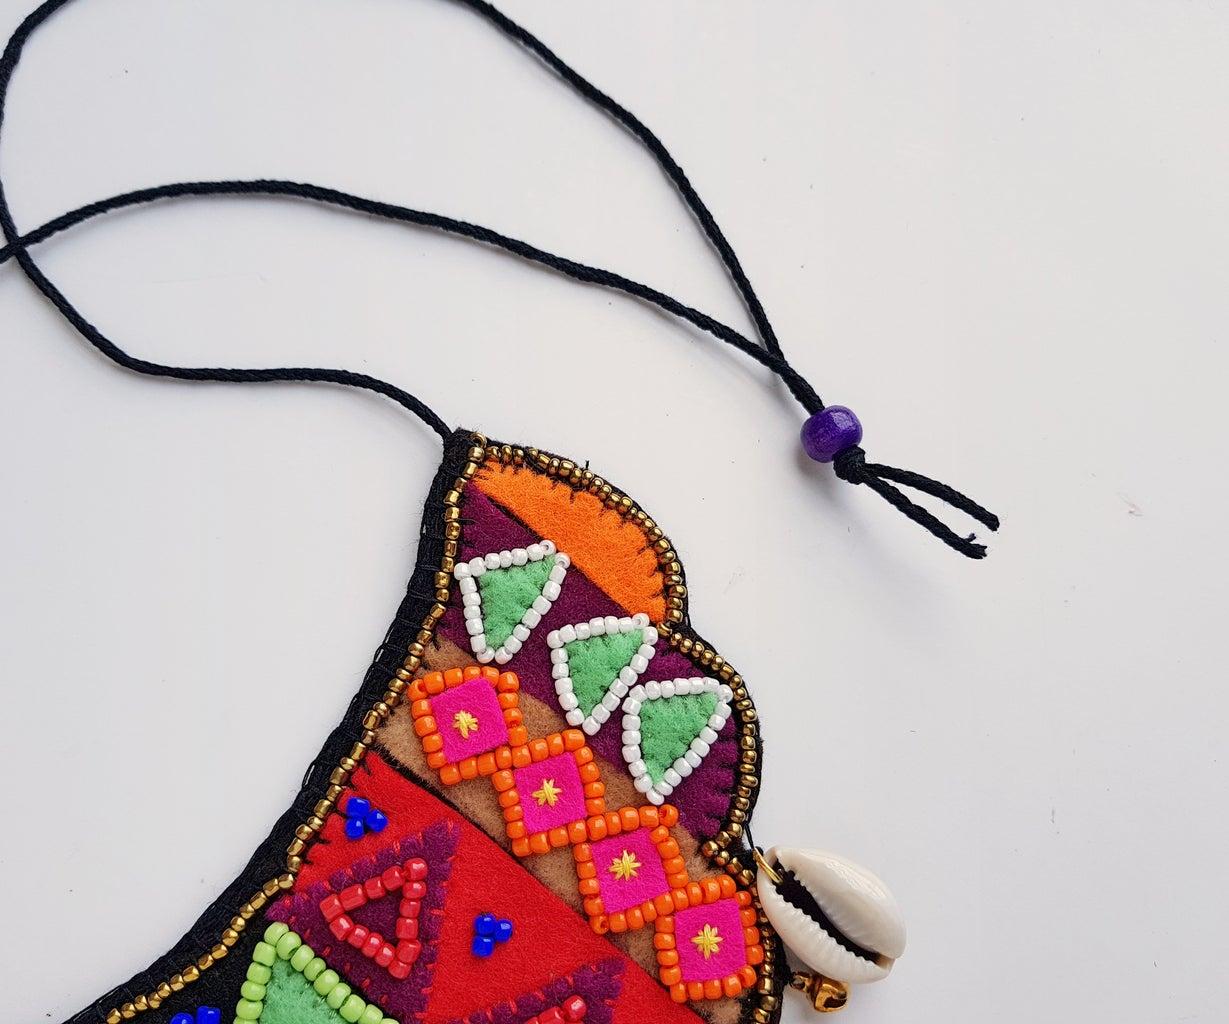 Necklace Closure